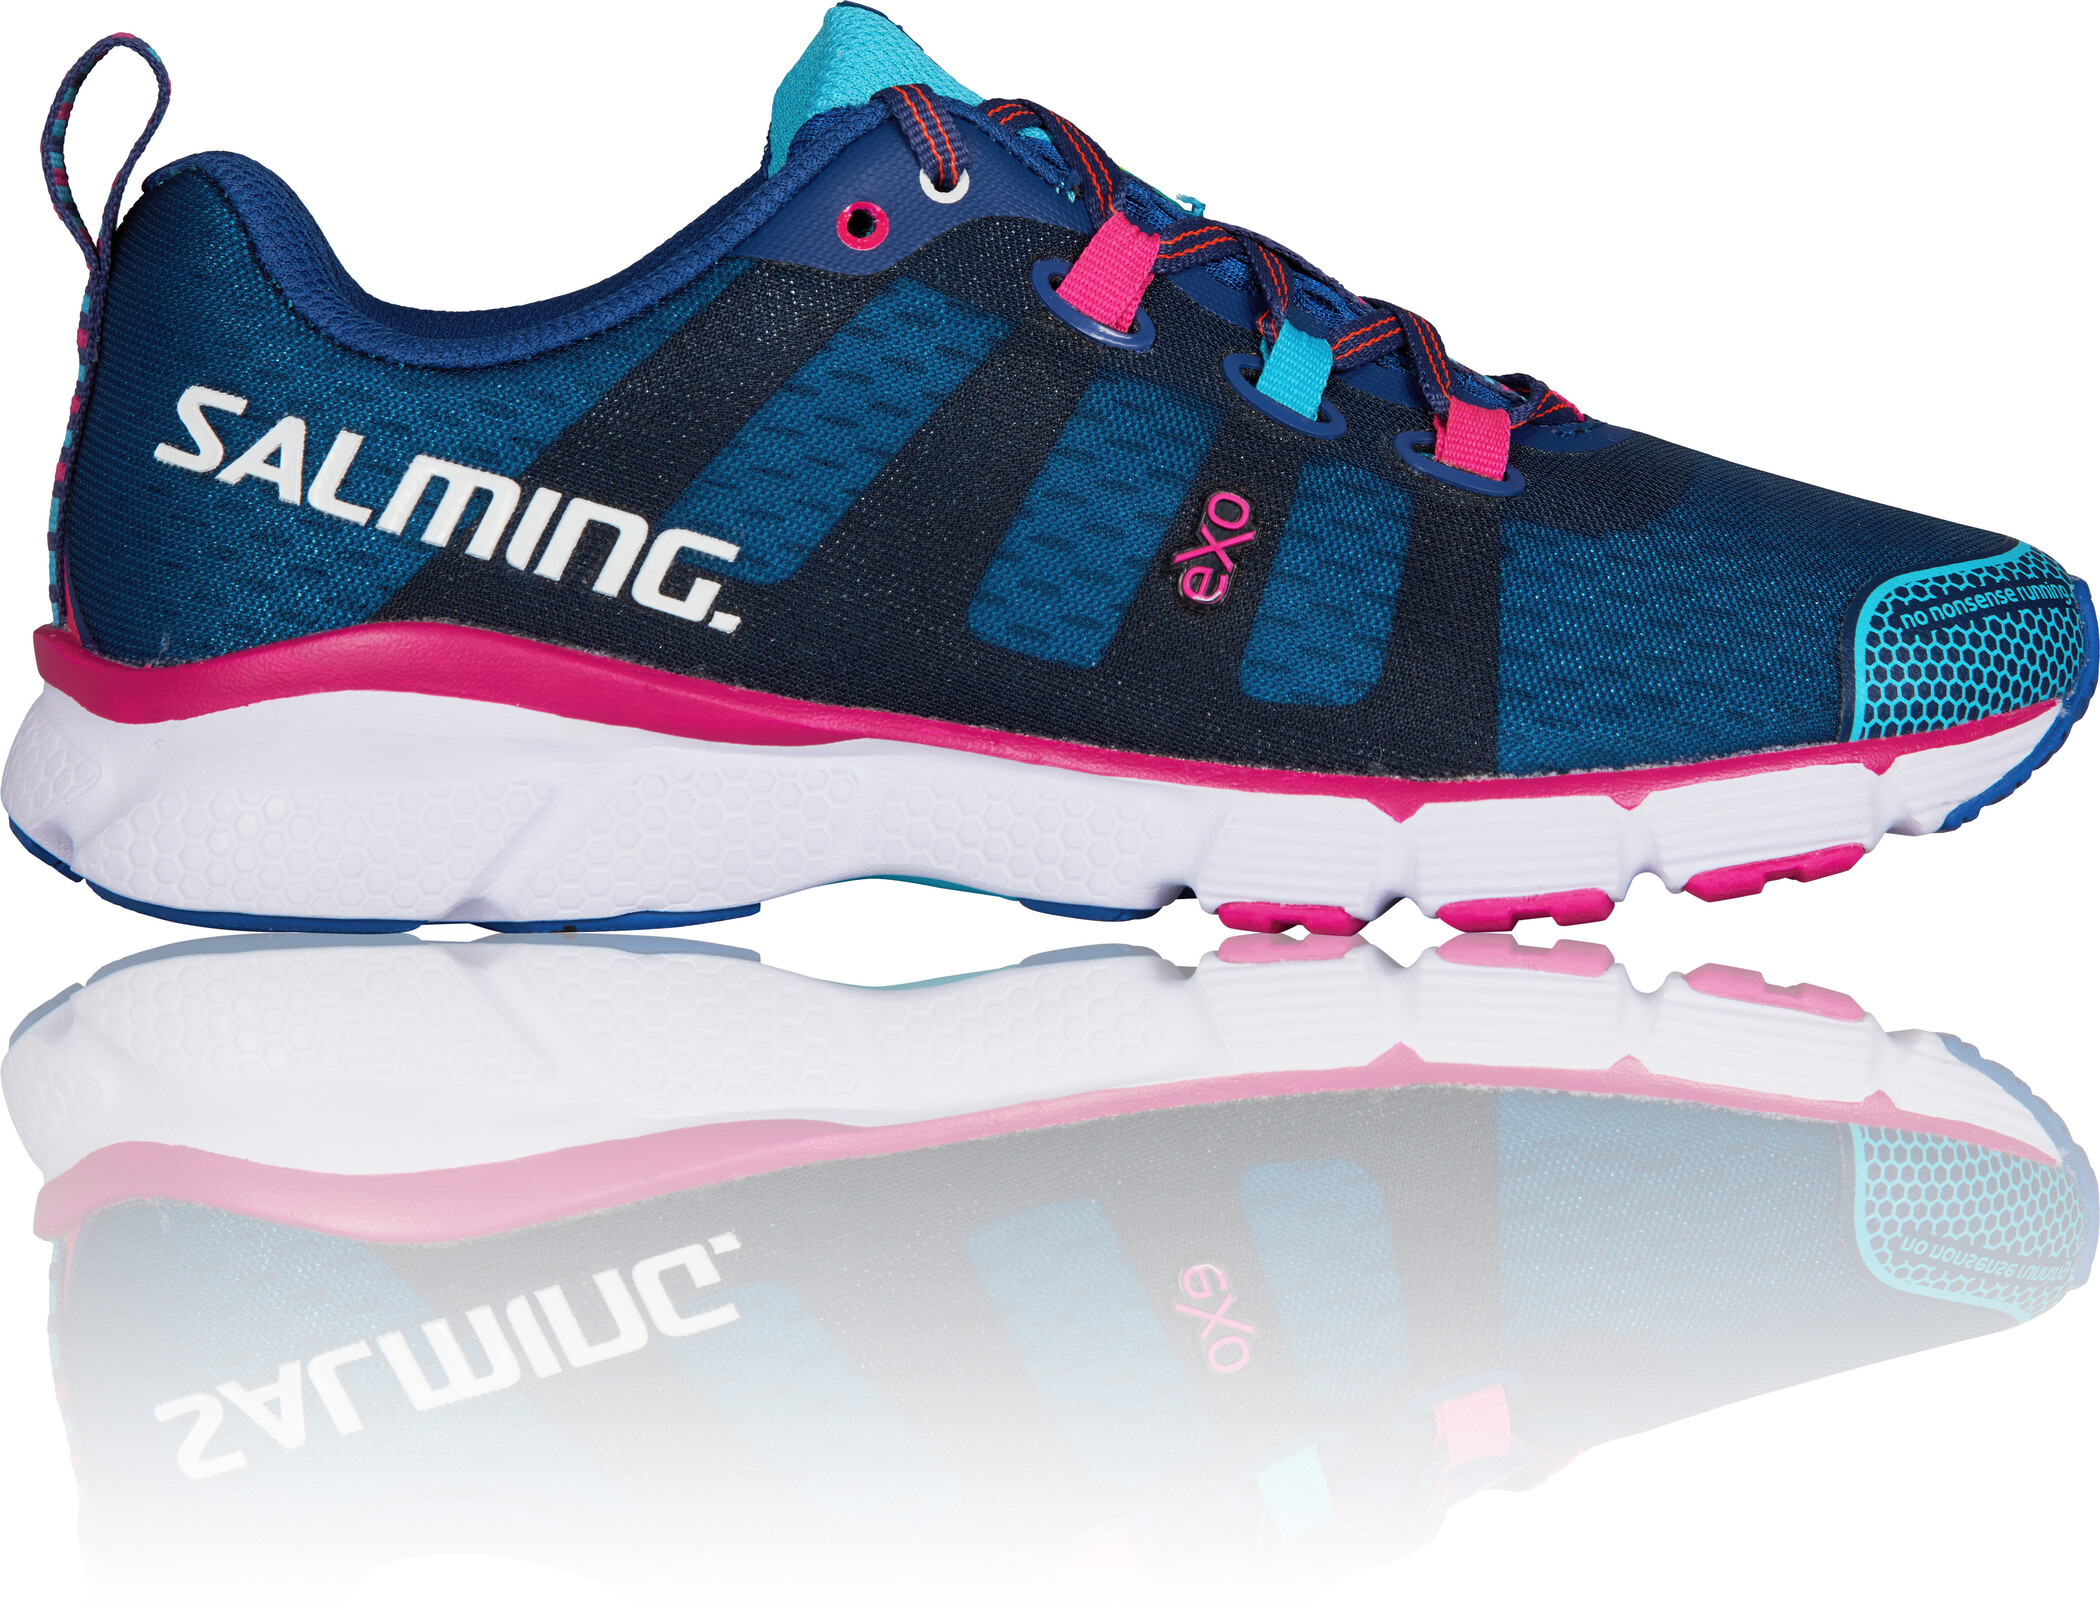 Salming enRoute 2 Sko Damer, limoges blue/blue atoll | Running shoes